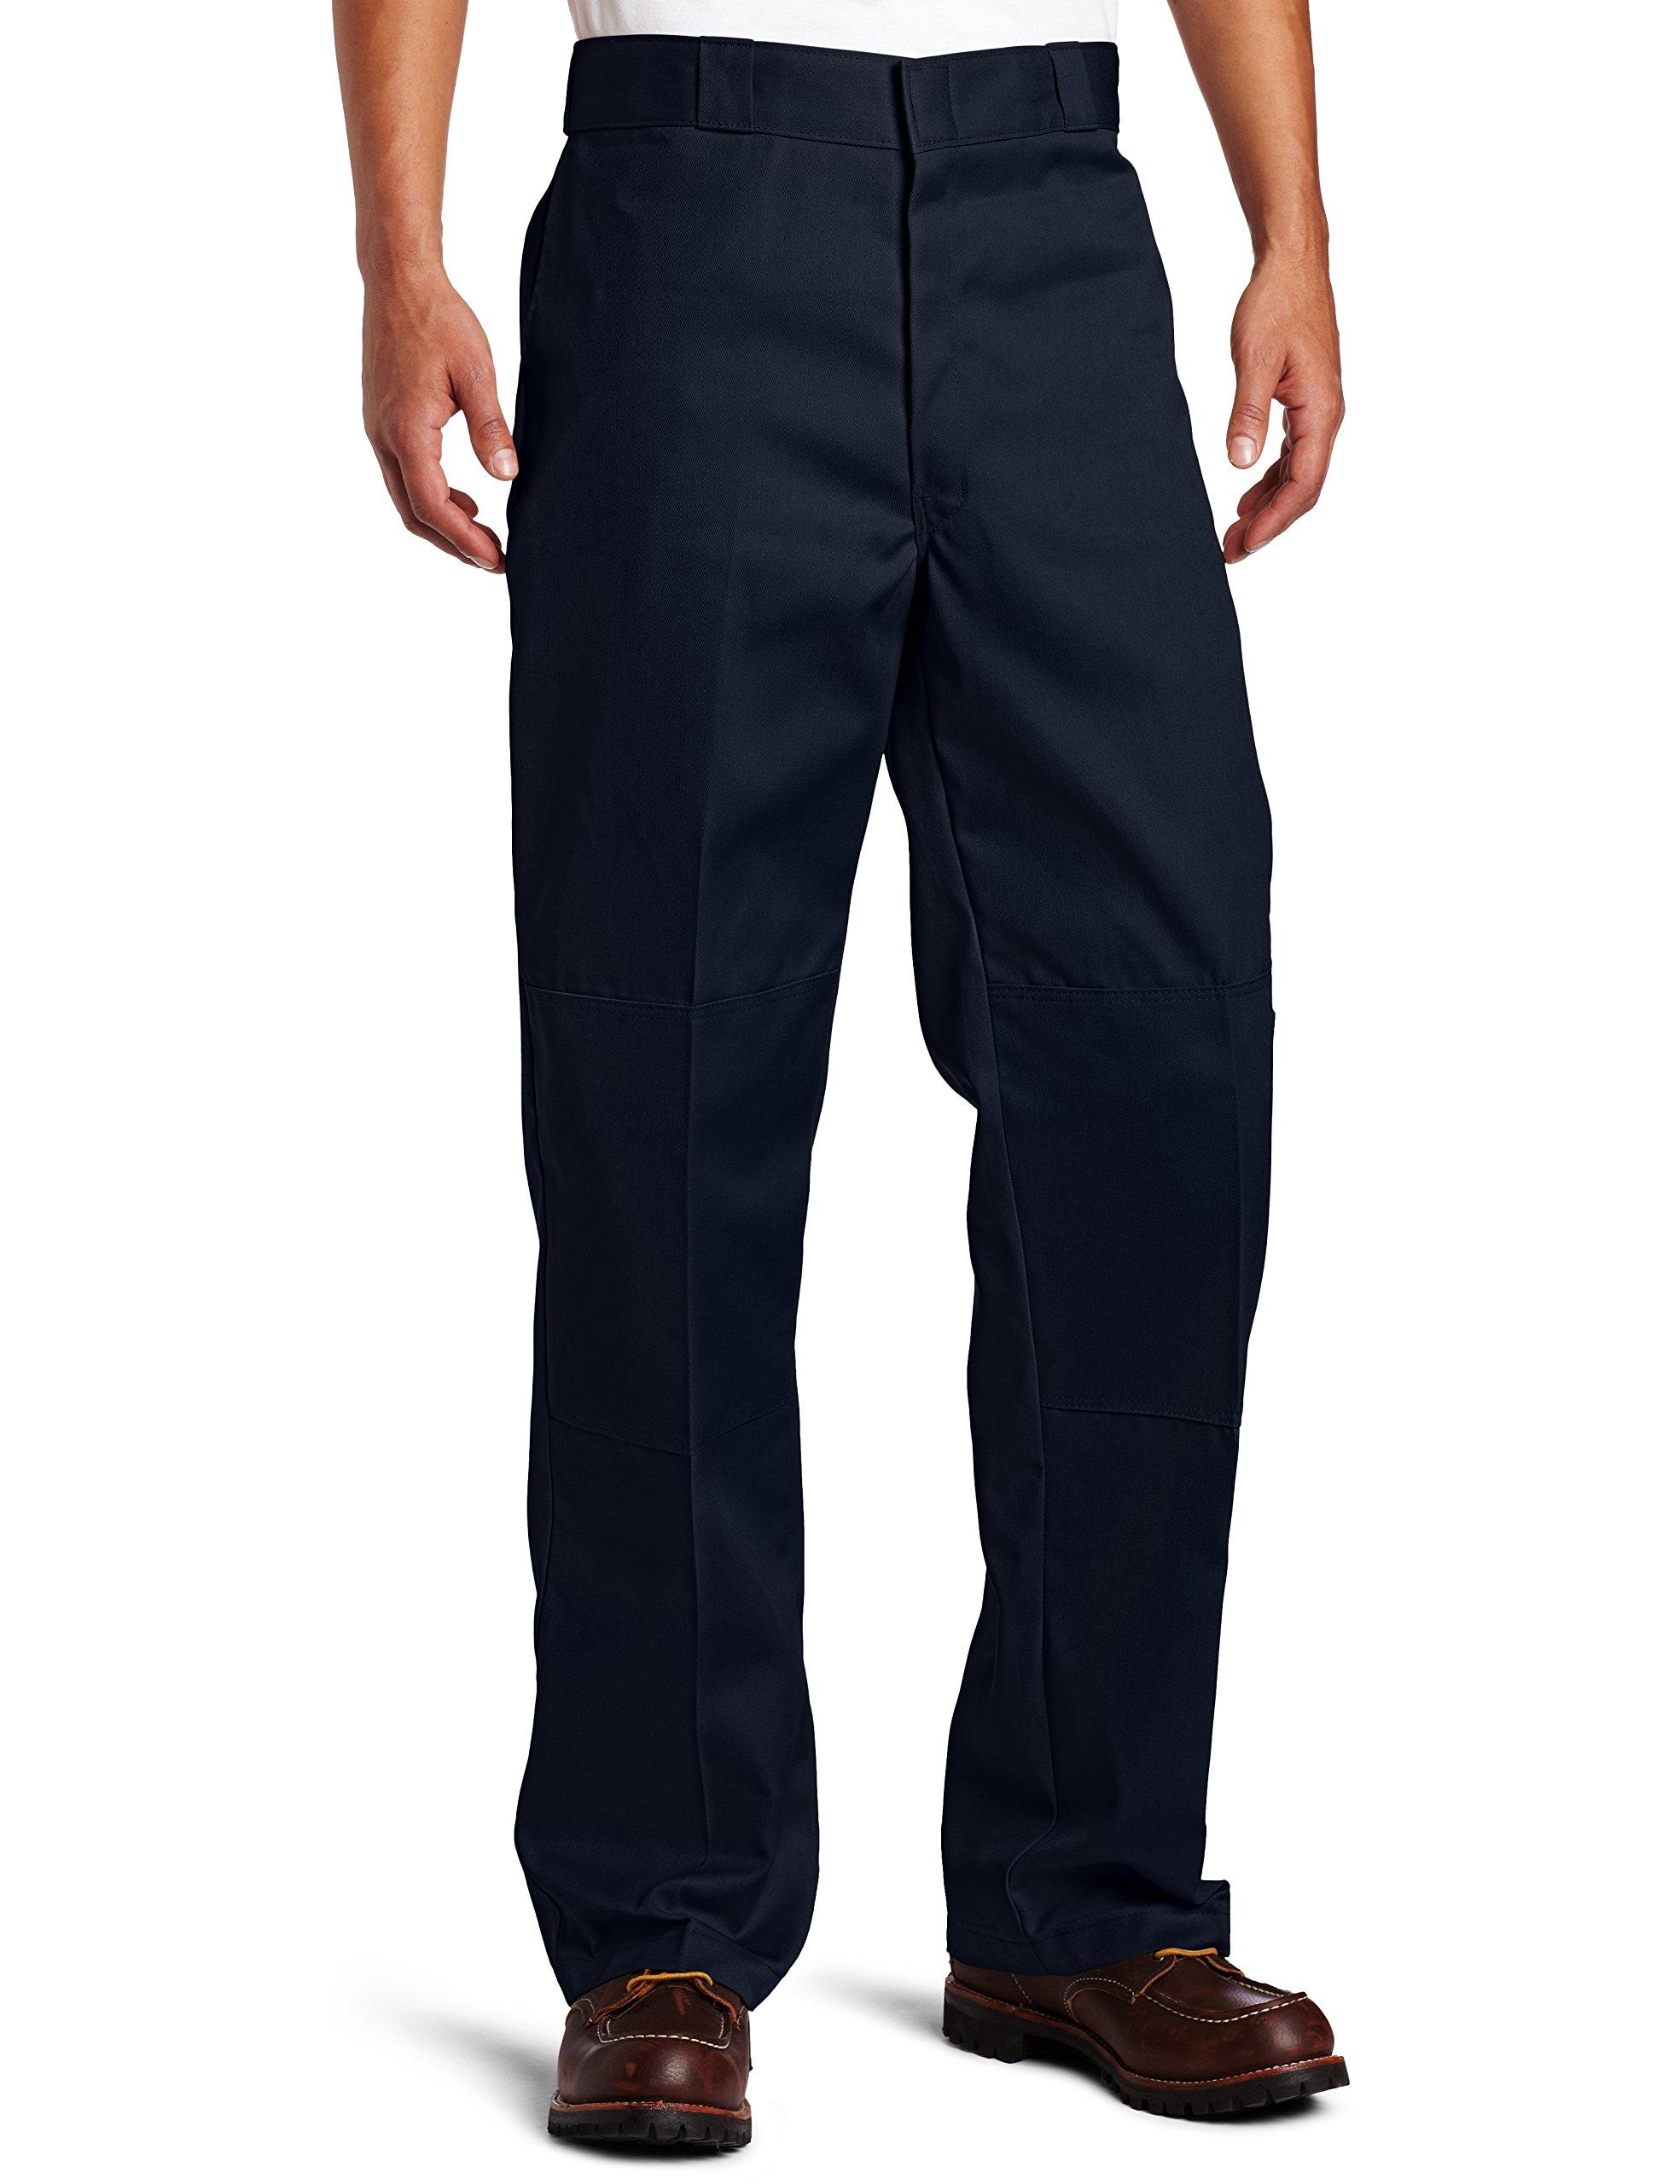 Dickies Men's Loose Fit Double Knee Twill Work Pant, Dark Navy, 40W x 30L